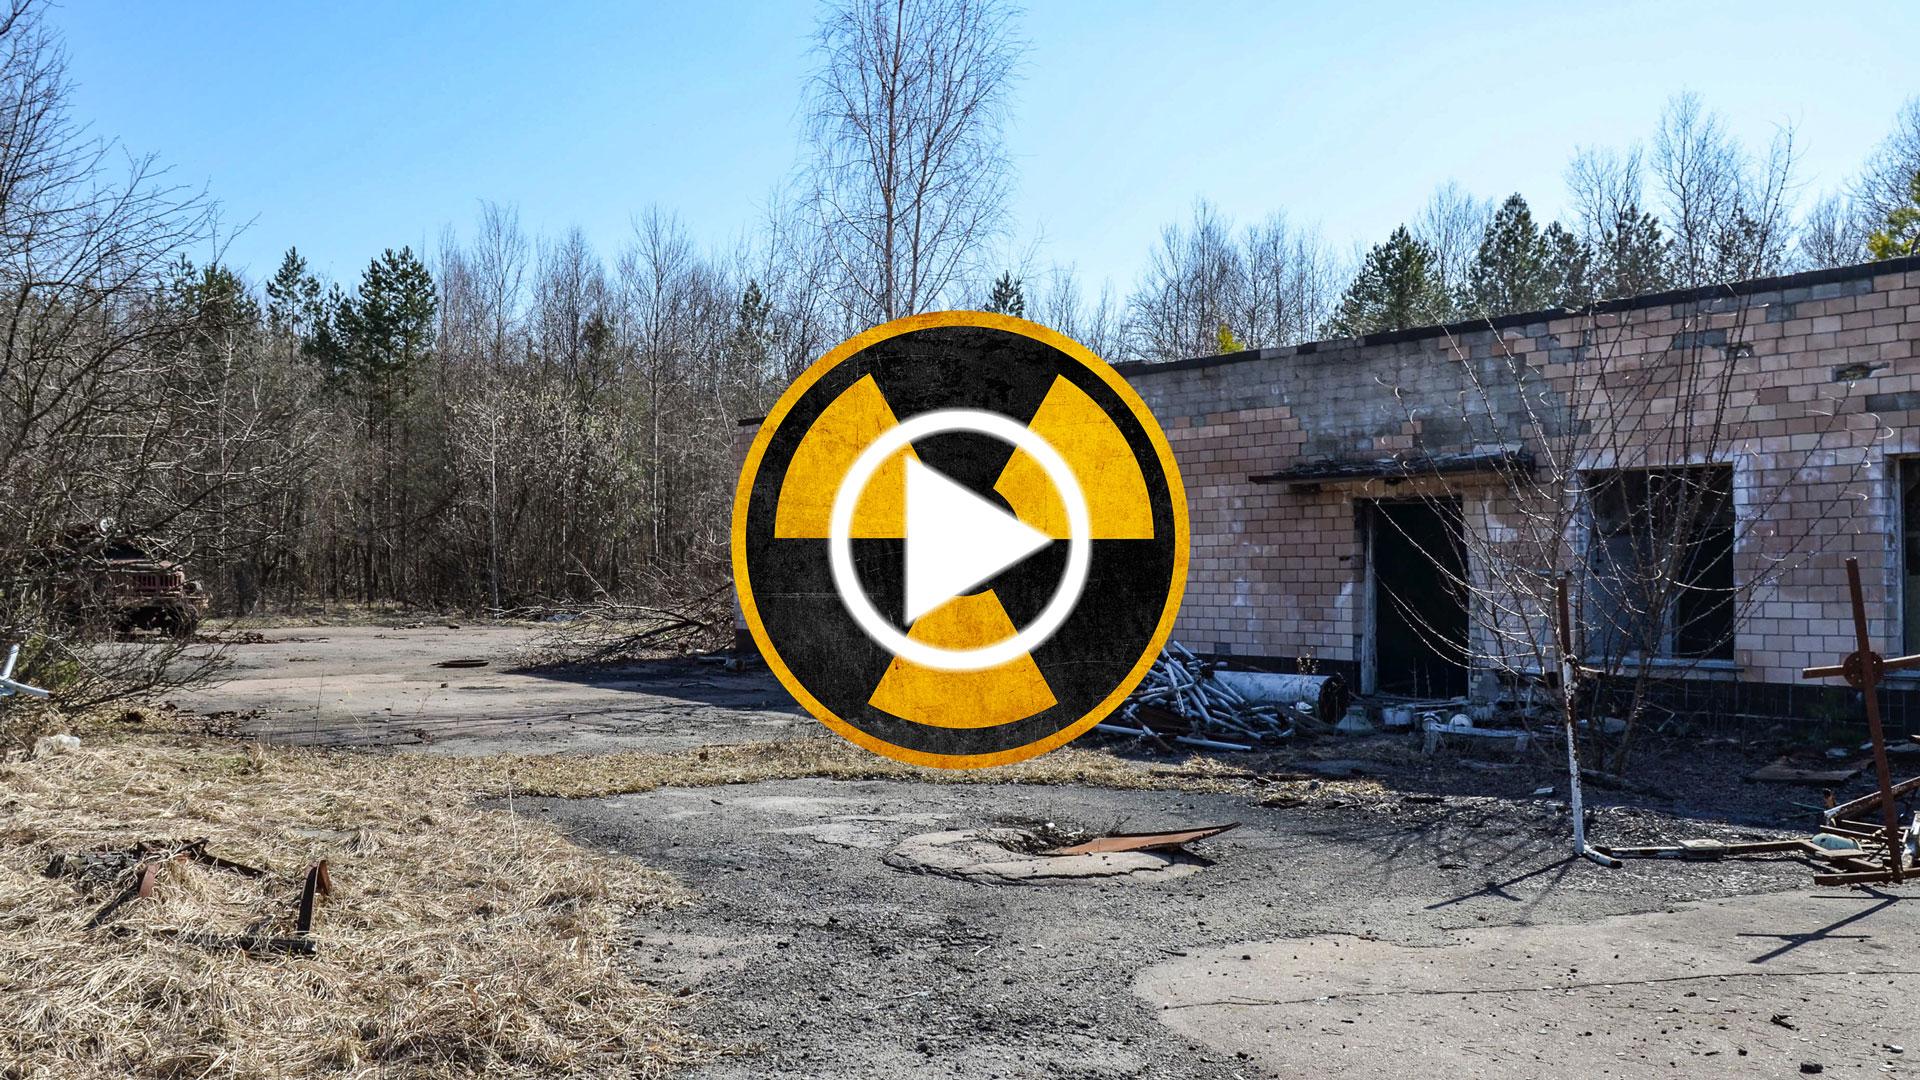 Krug Antenna Circle in the Chernobyl Zone